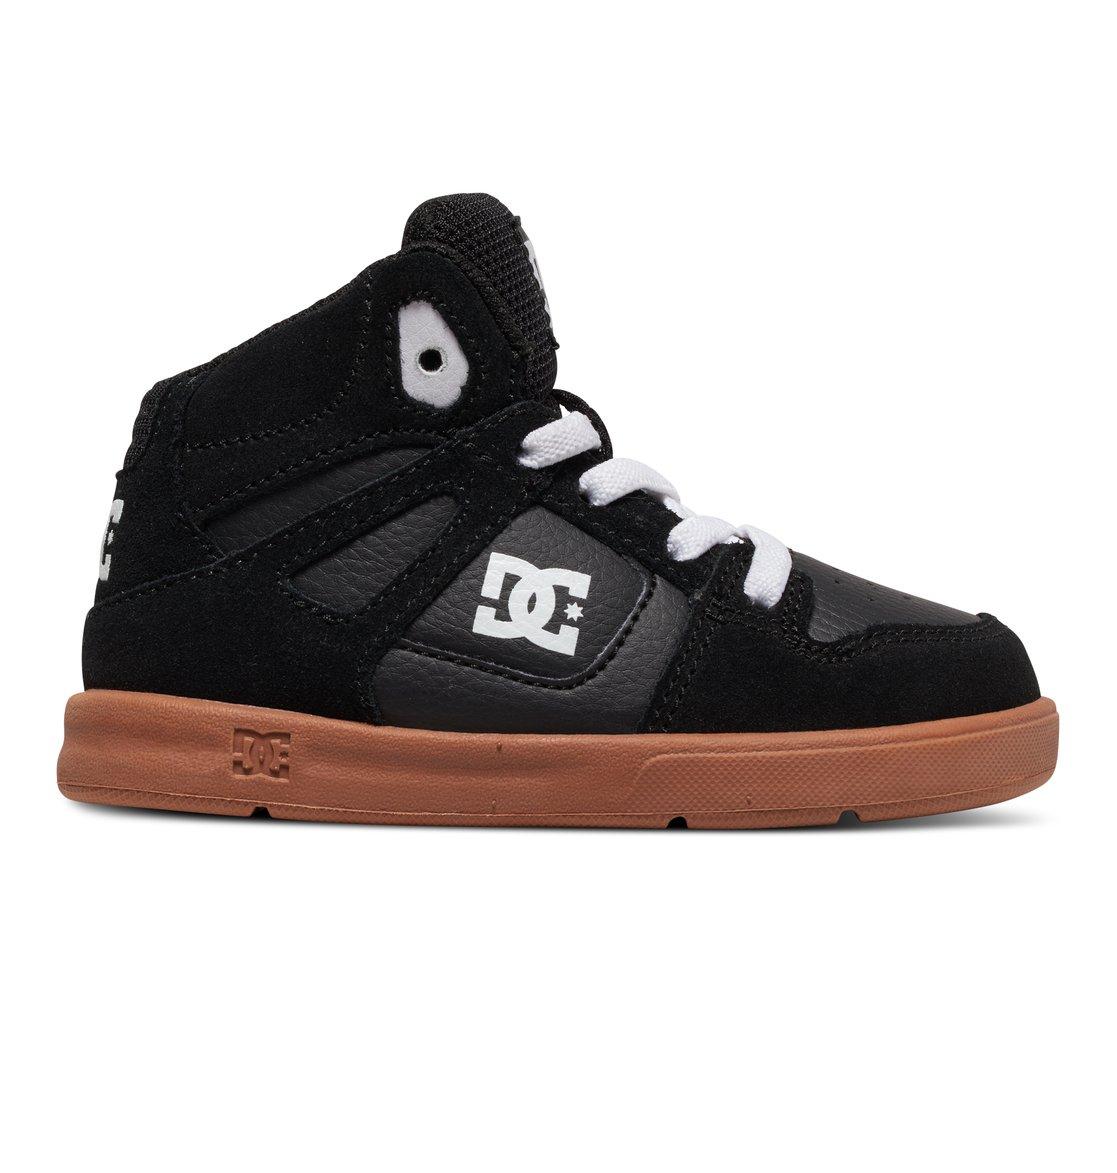 5dc503bd70 0 Rebound SE UL - High-Top Shoes ADTS700021 DC Shoes